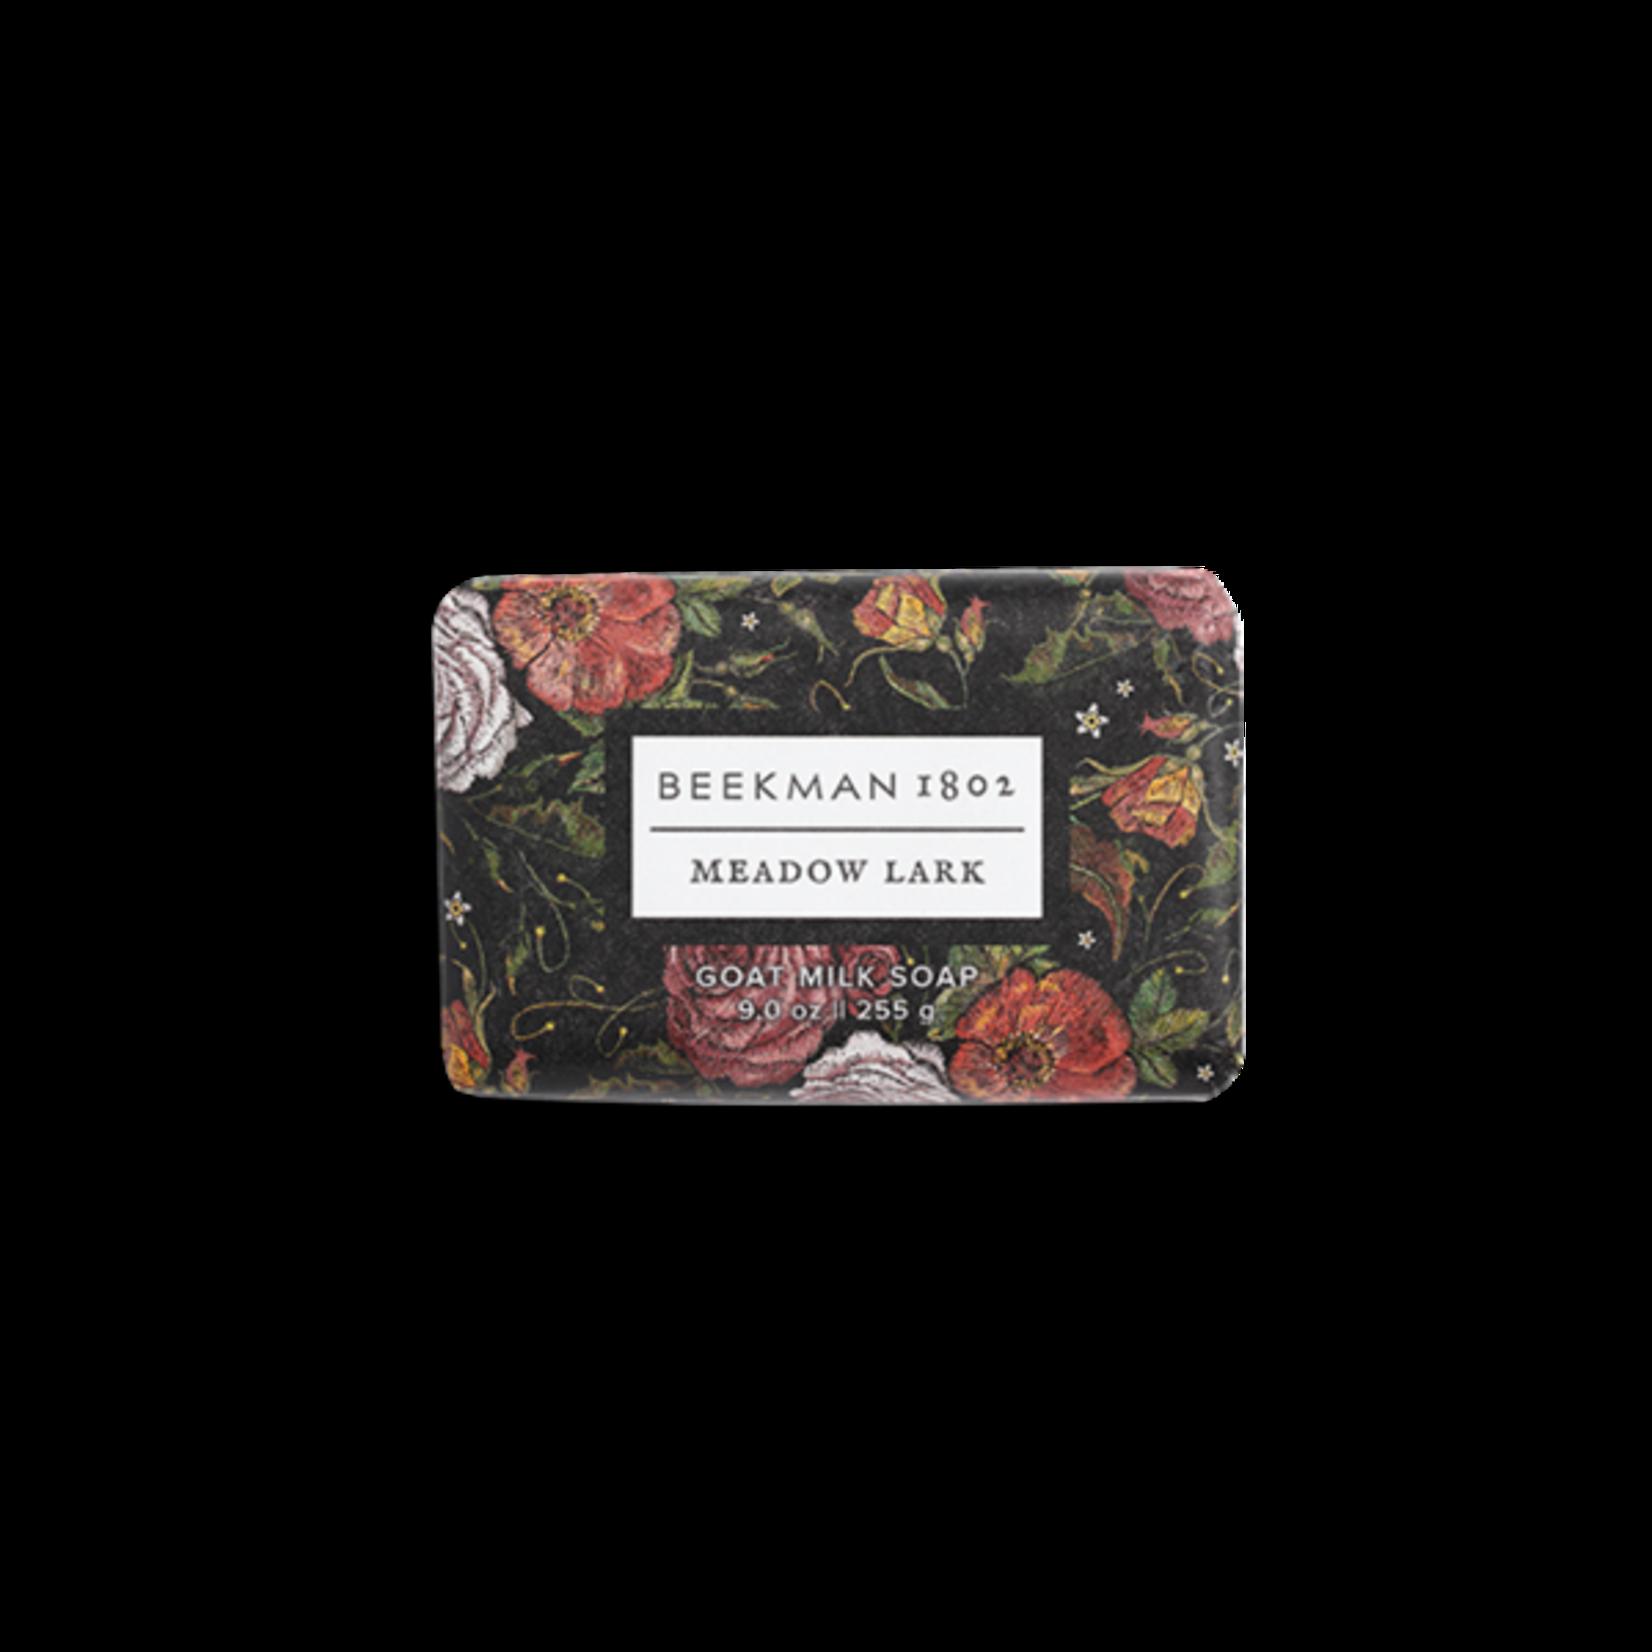 Meadow Lark 9 oz Goats Milk Bar Soap